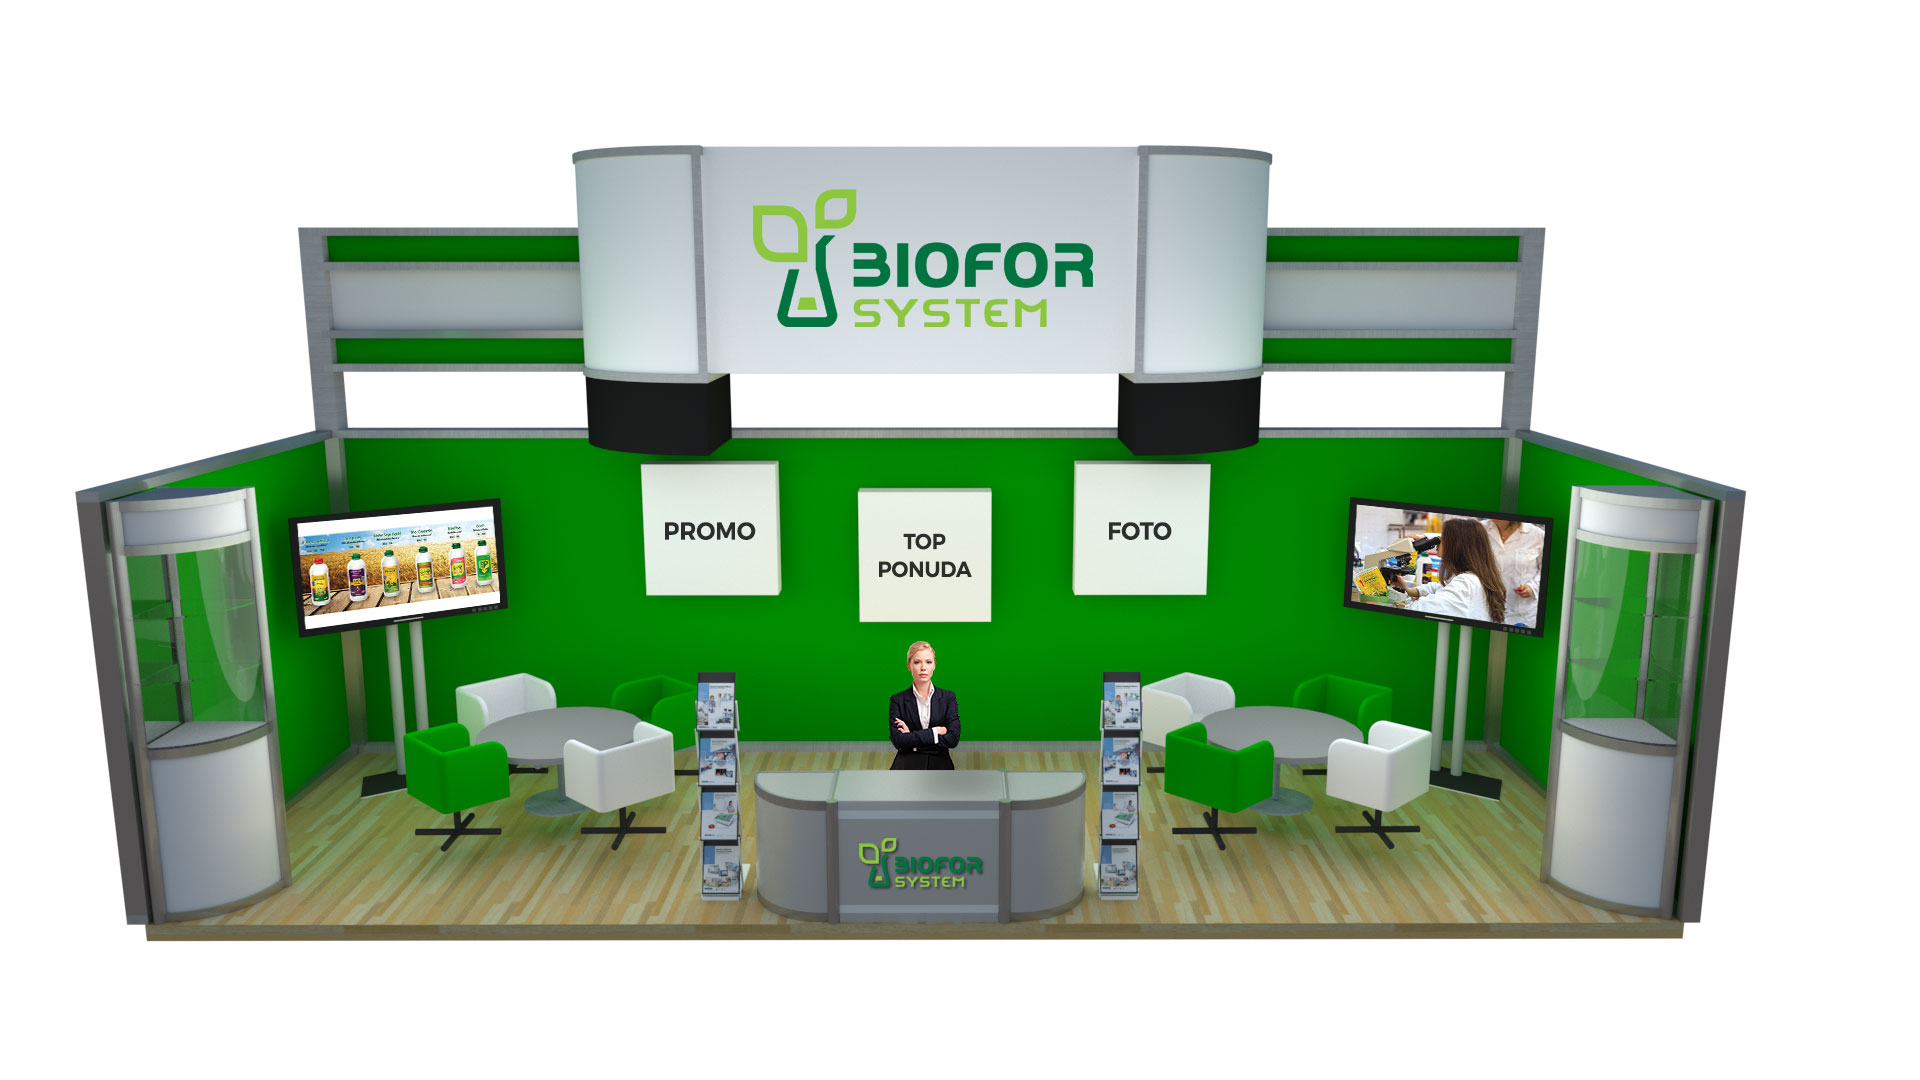 biofor